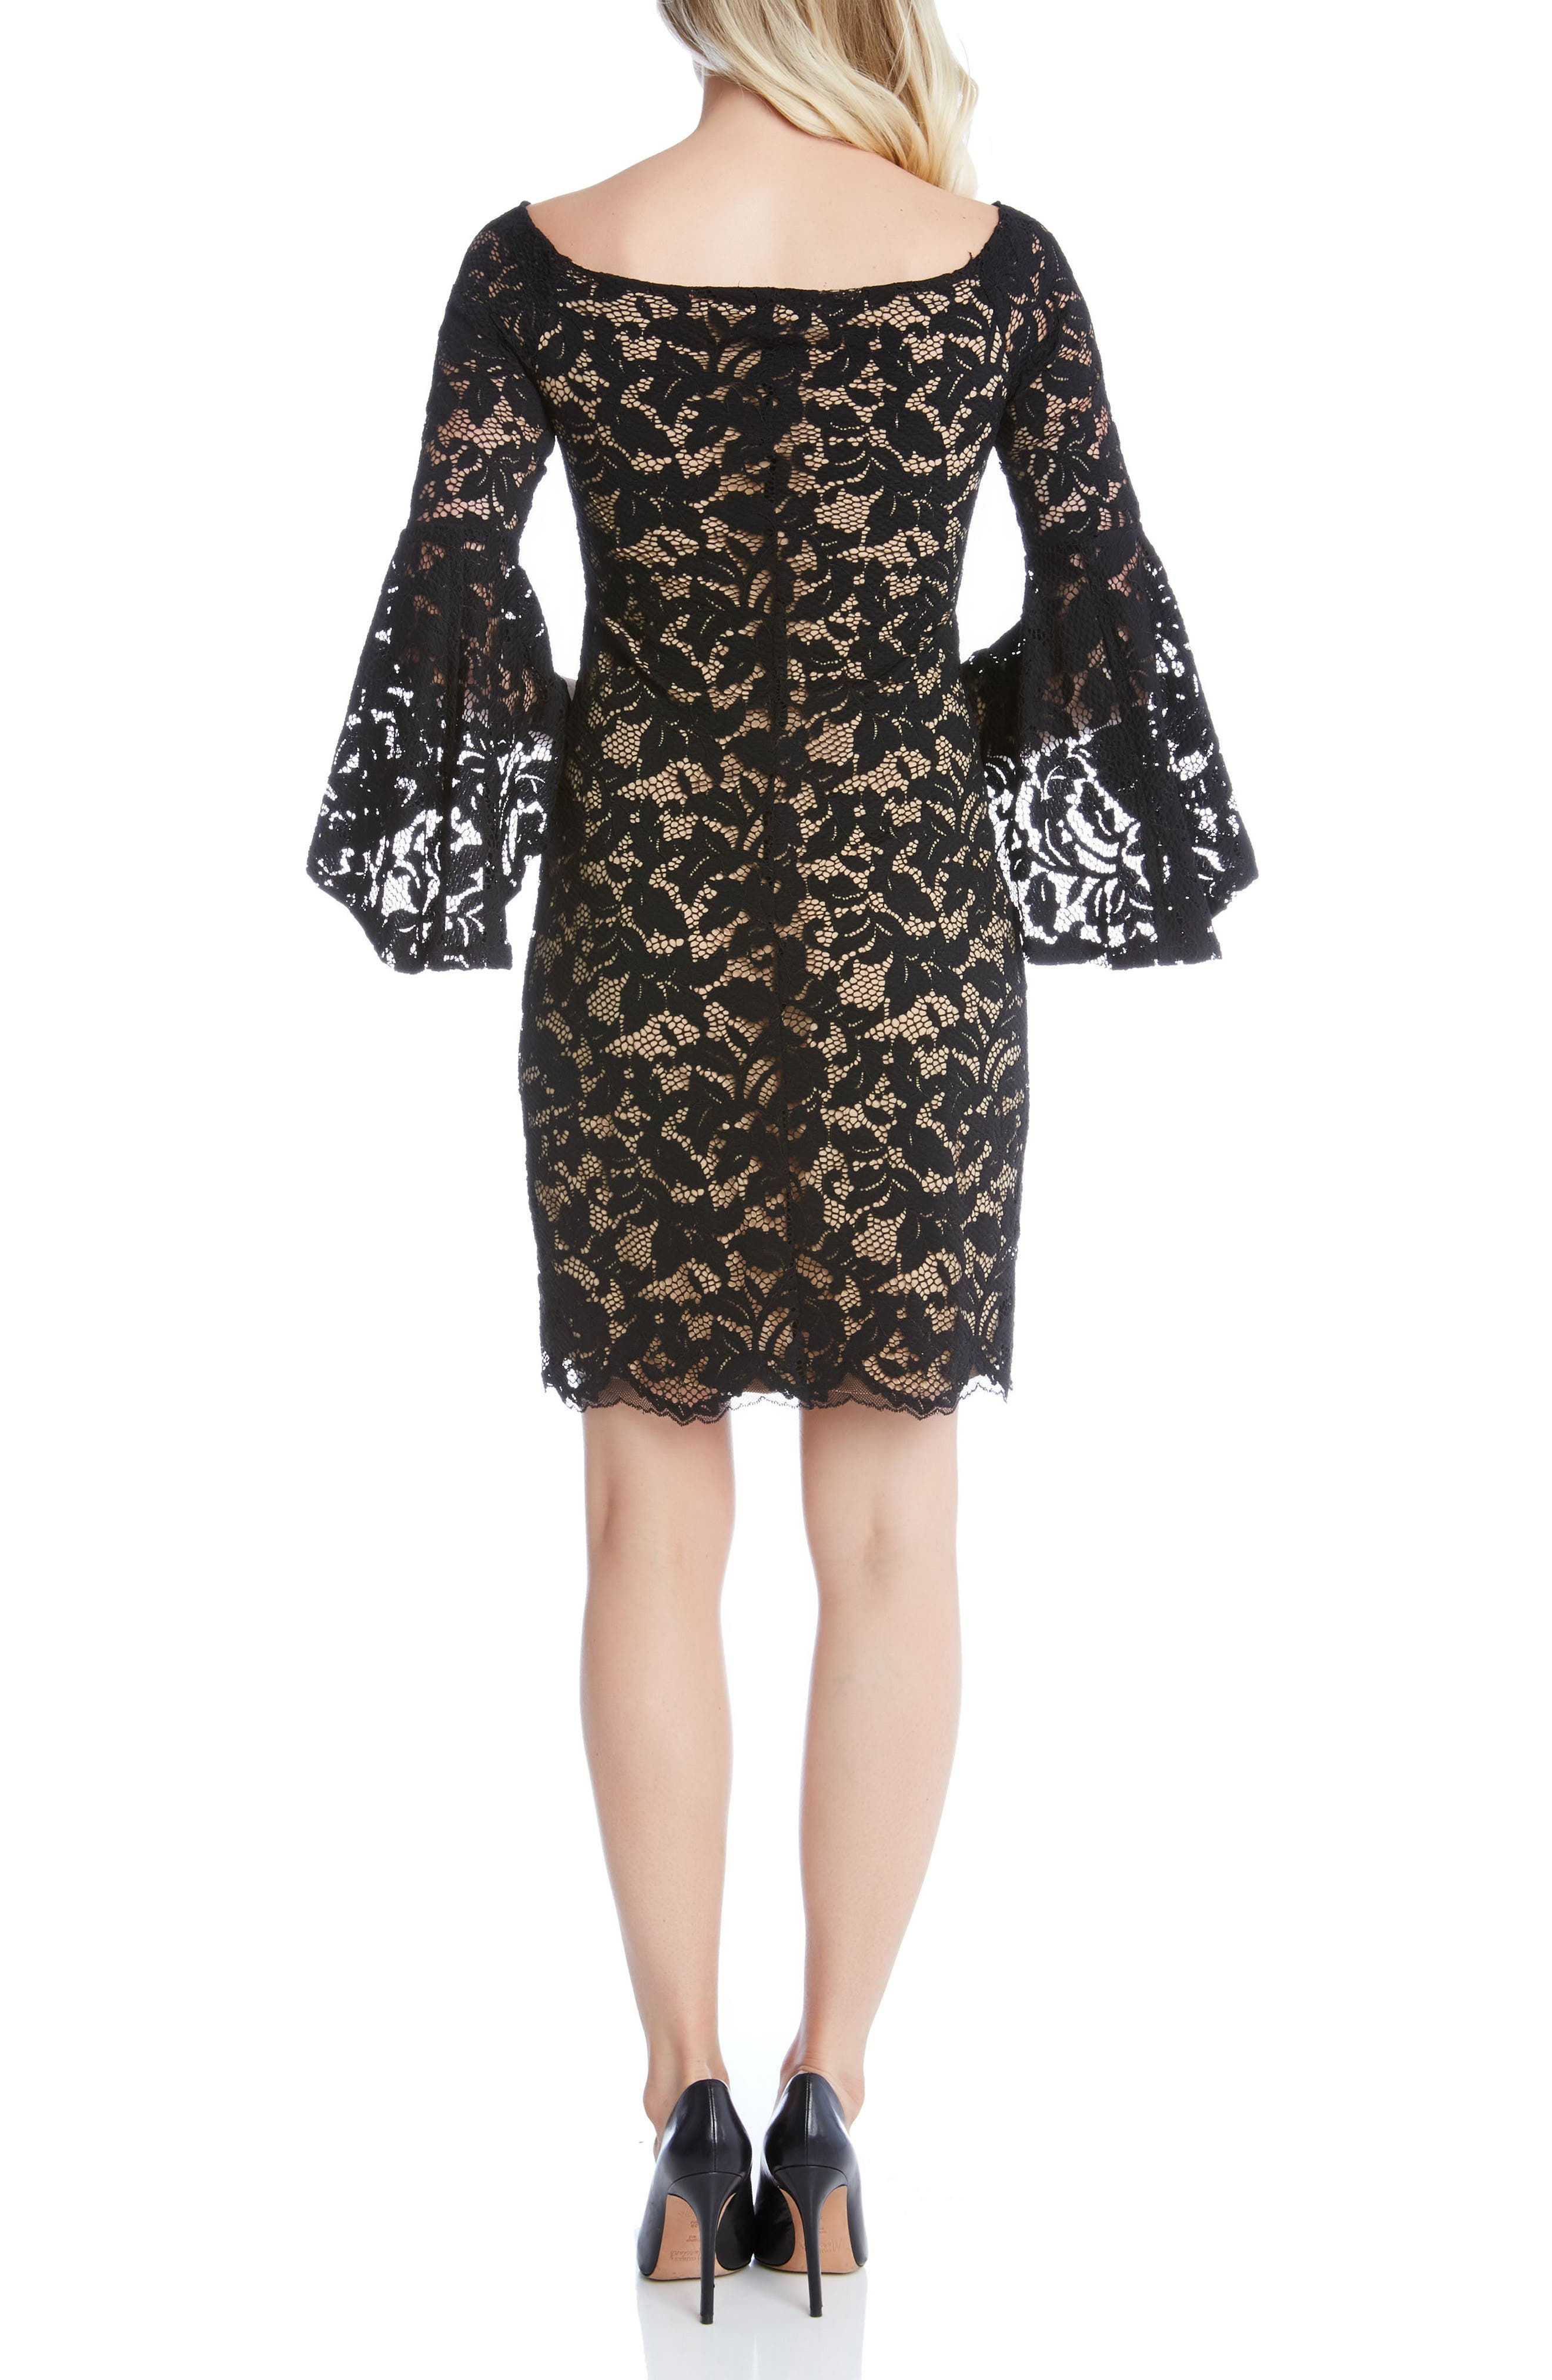 Samantha Lace Off the Shoulder Sheath Dress,                             Alternate thumbnail 2, color,                             BLACK/ NUDE